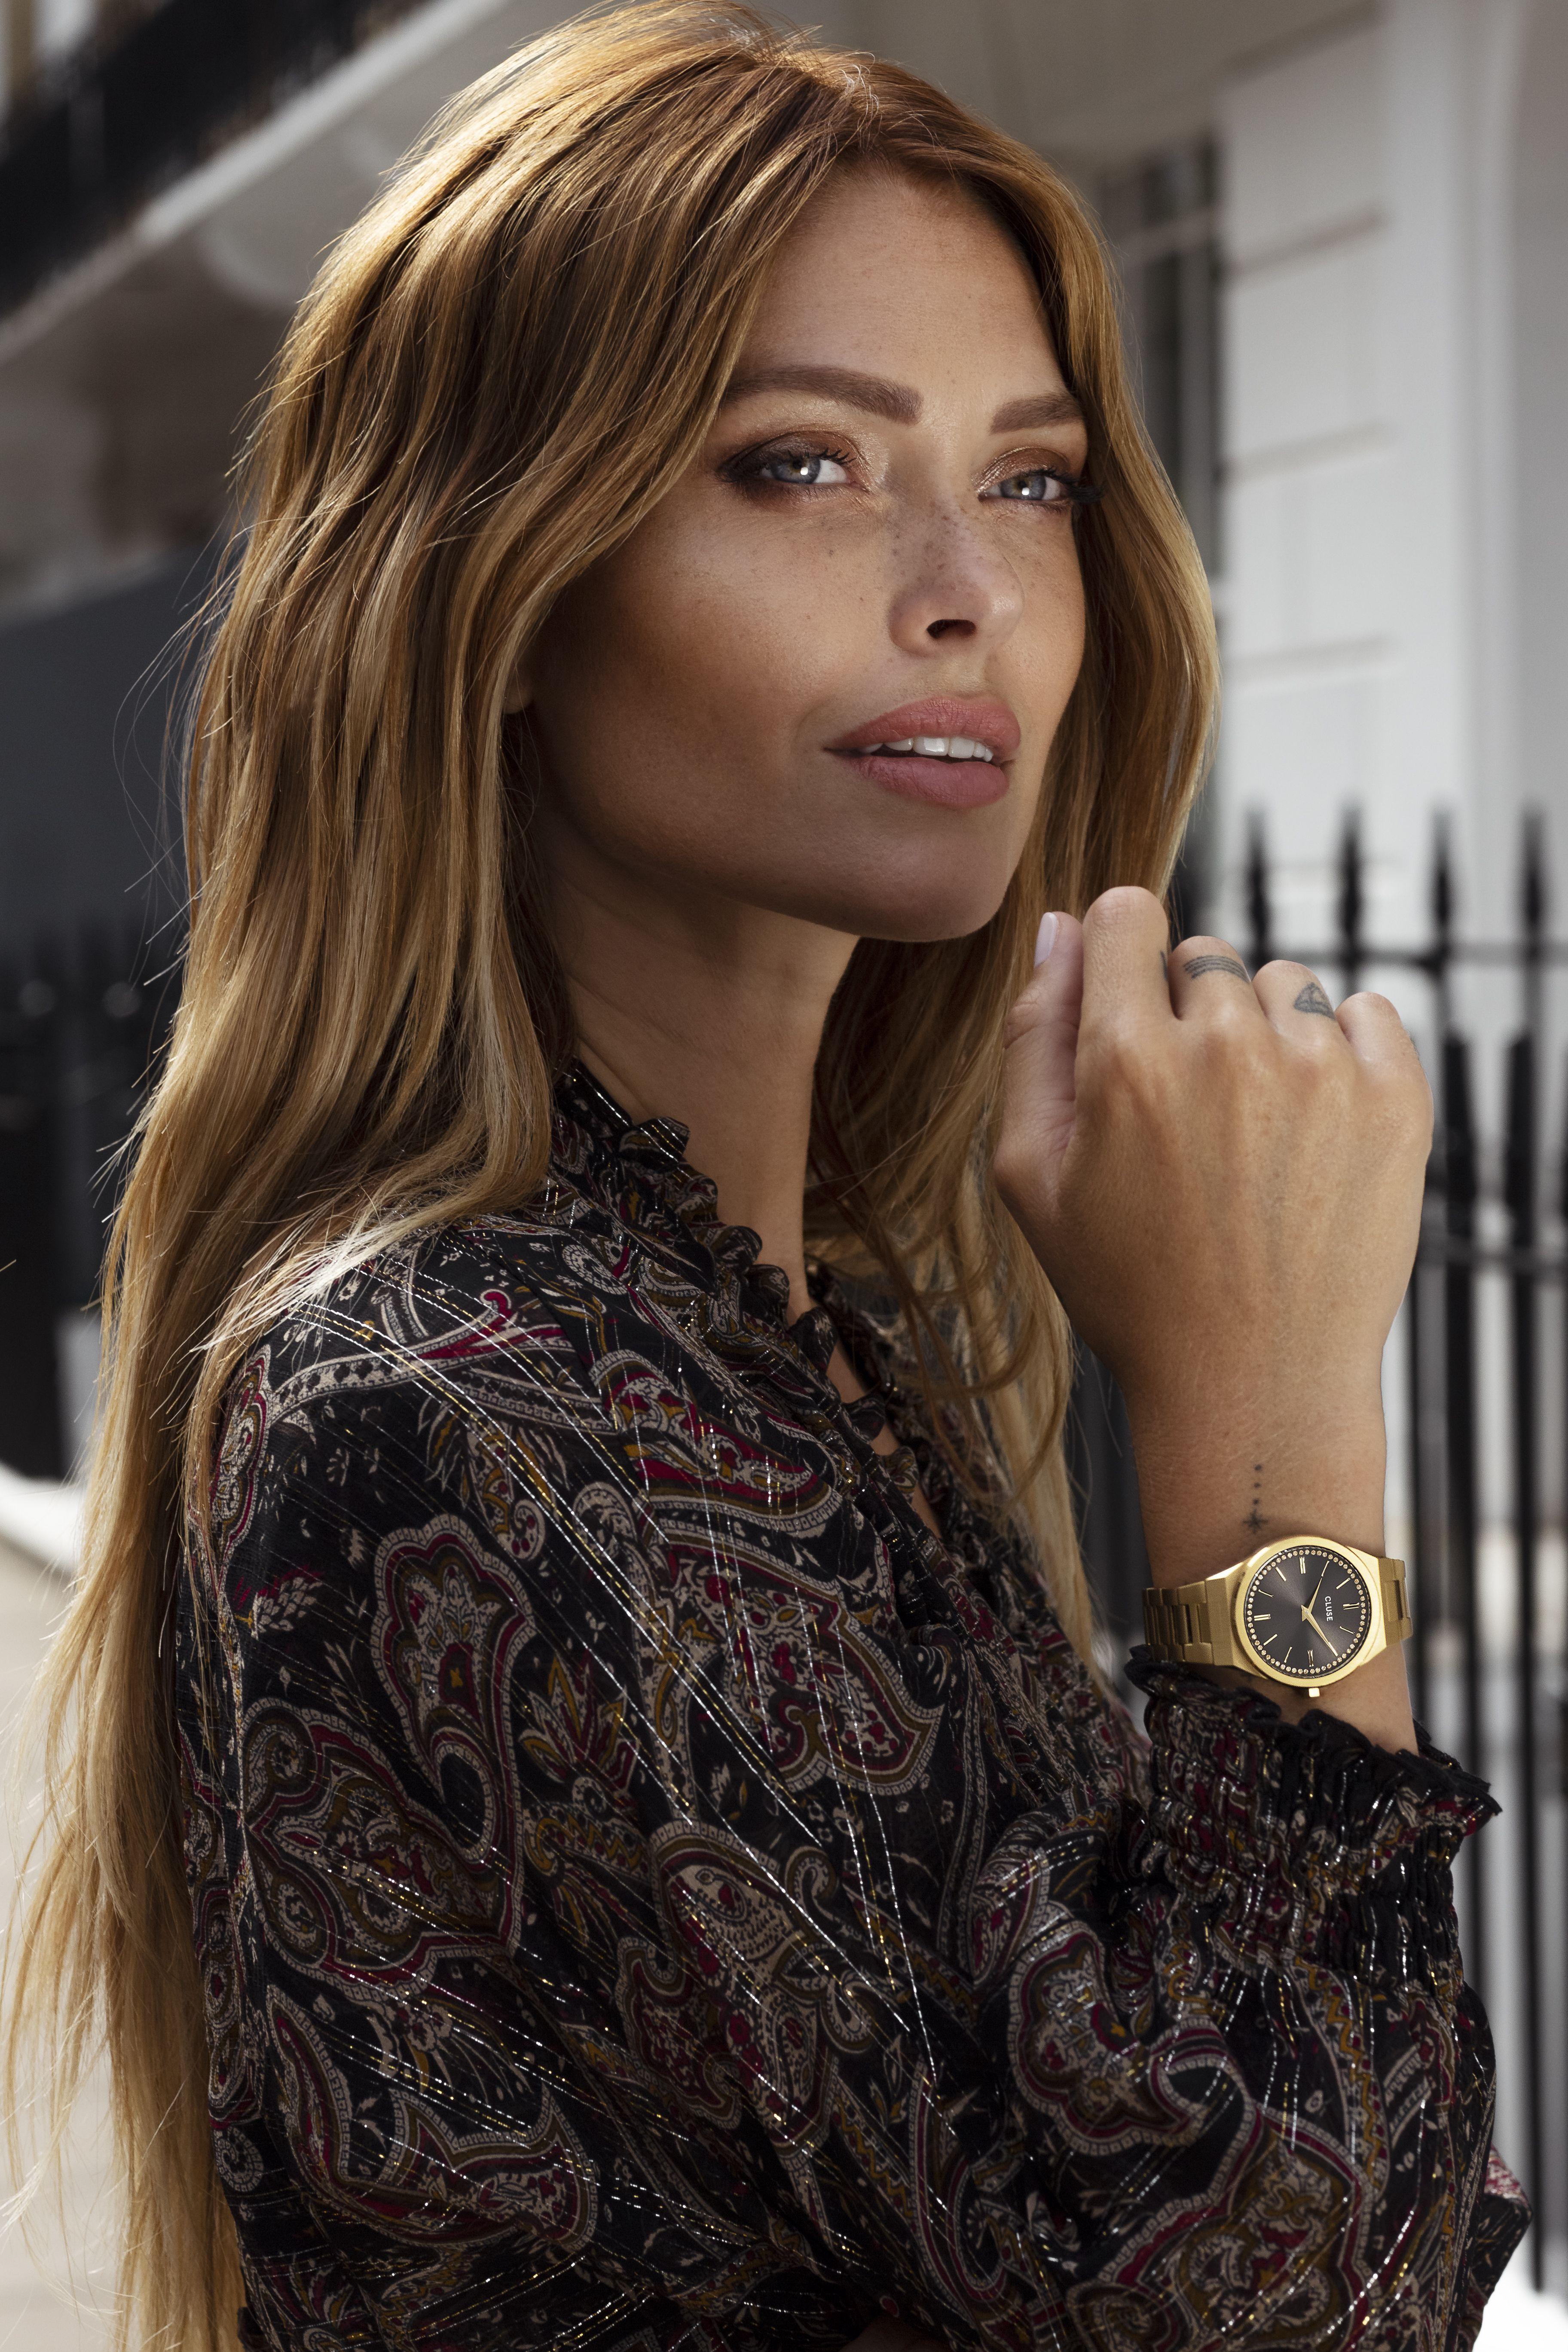 Montre Cluse Caroline Receveur : montre, cluse, caroline, receveur, Épinglé, CLUSE, Photoshoots, Campaigns